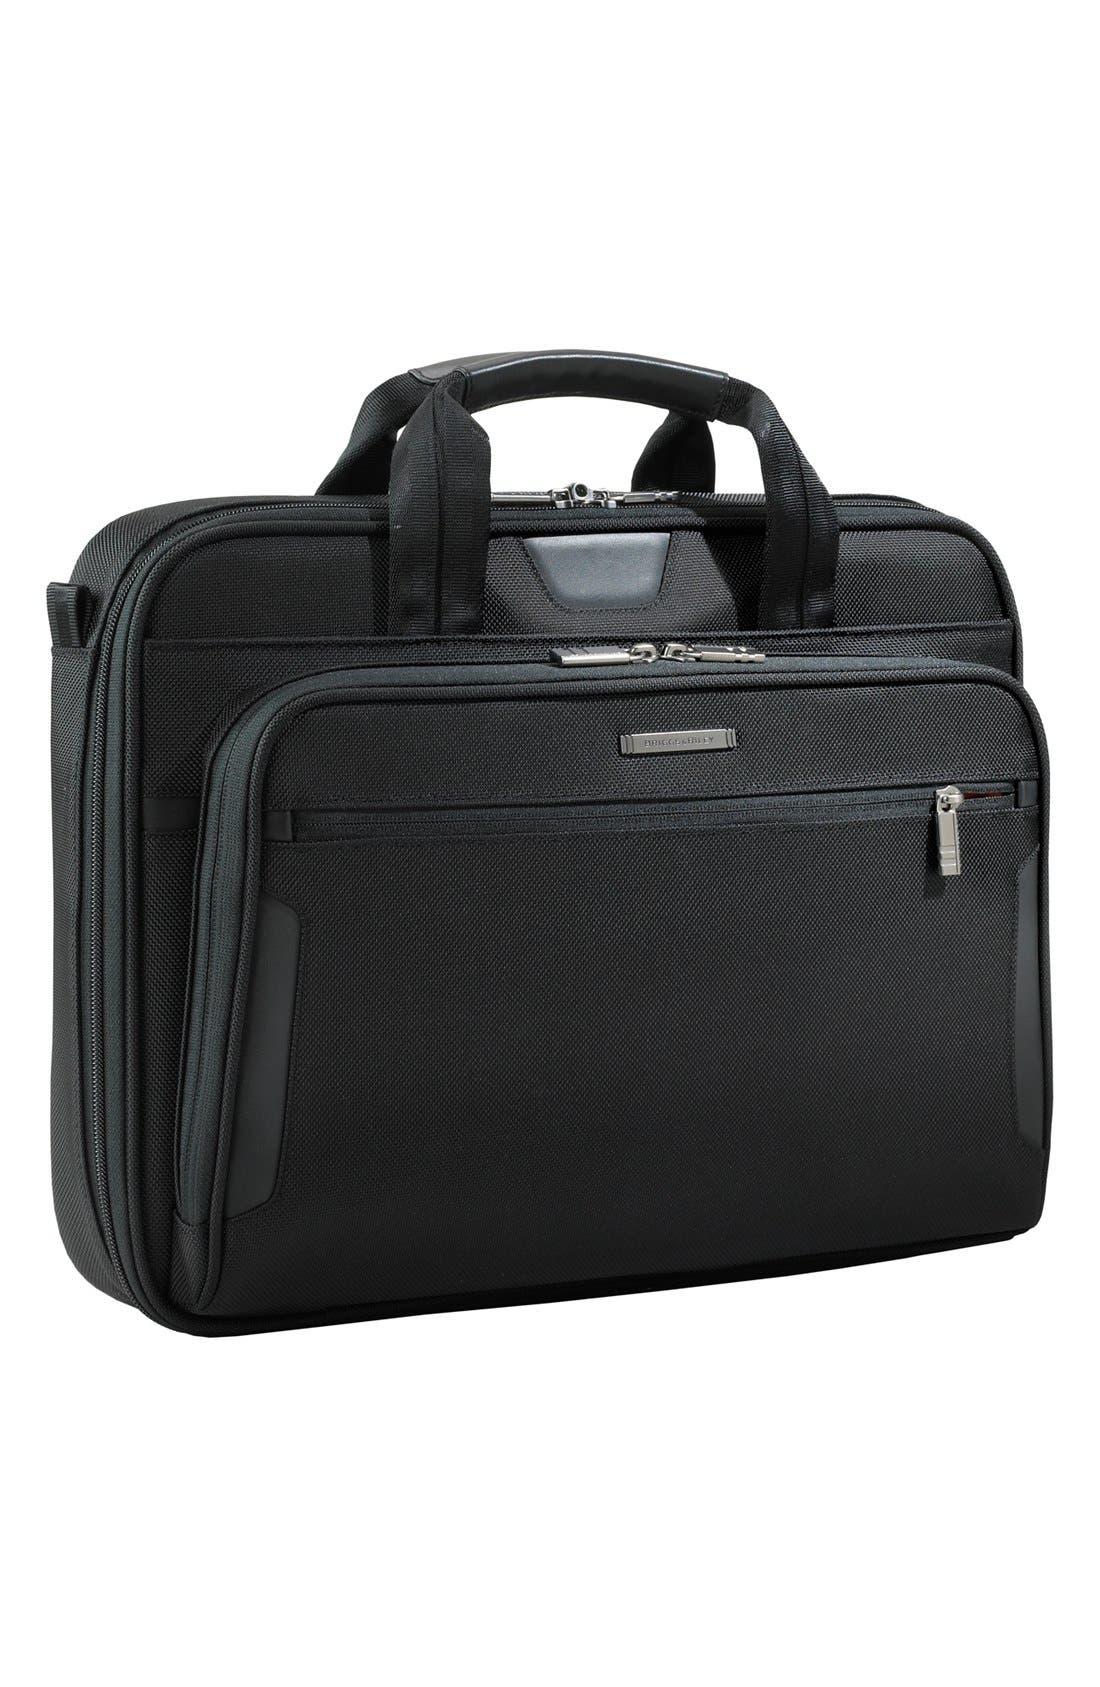 Main Image - Briggs & Riley 'Medium Slim' Ballistic Nylon Briefcase